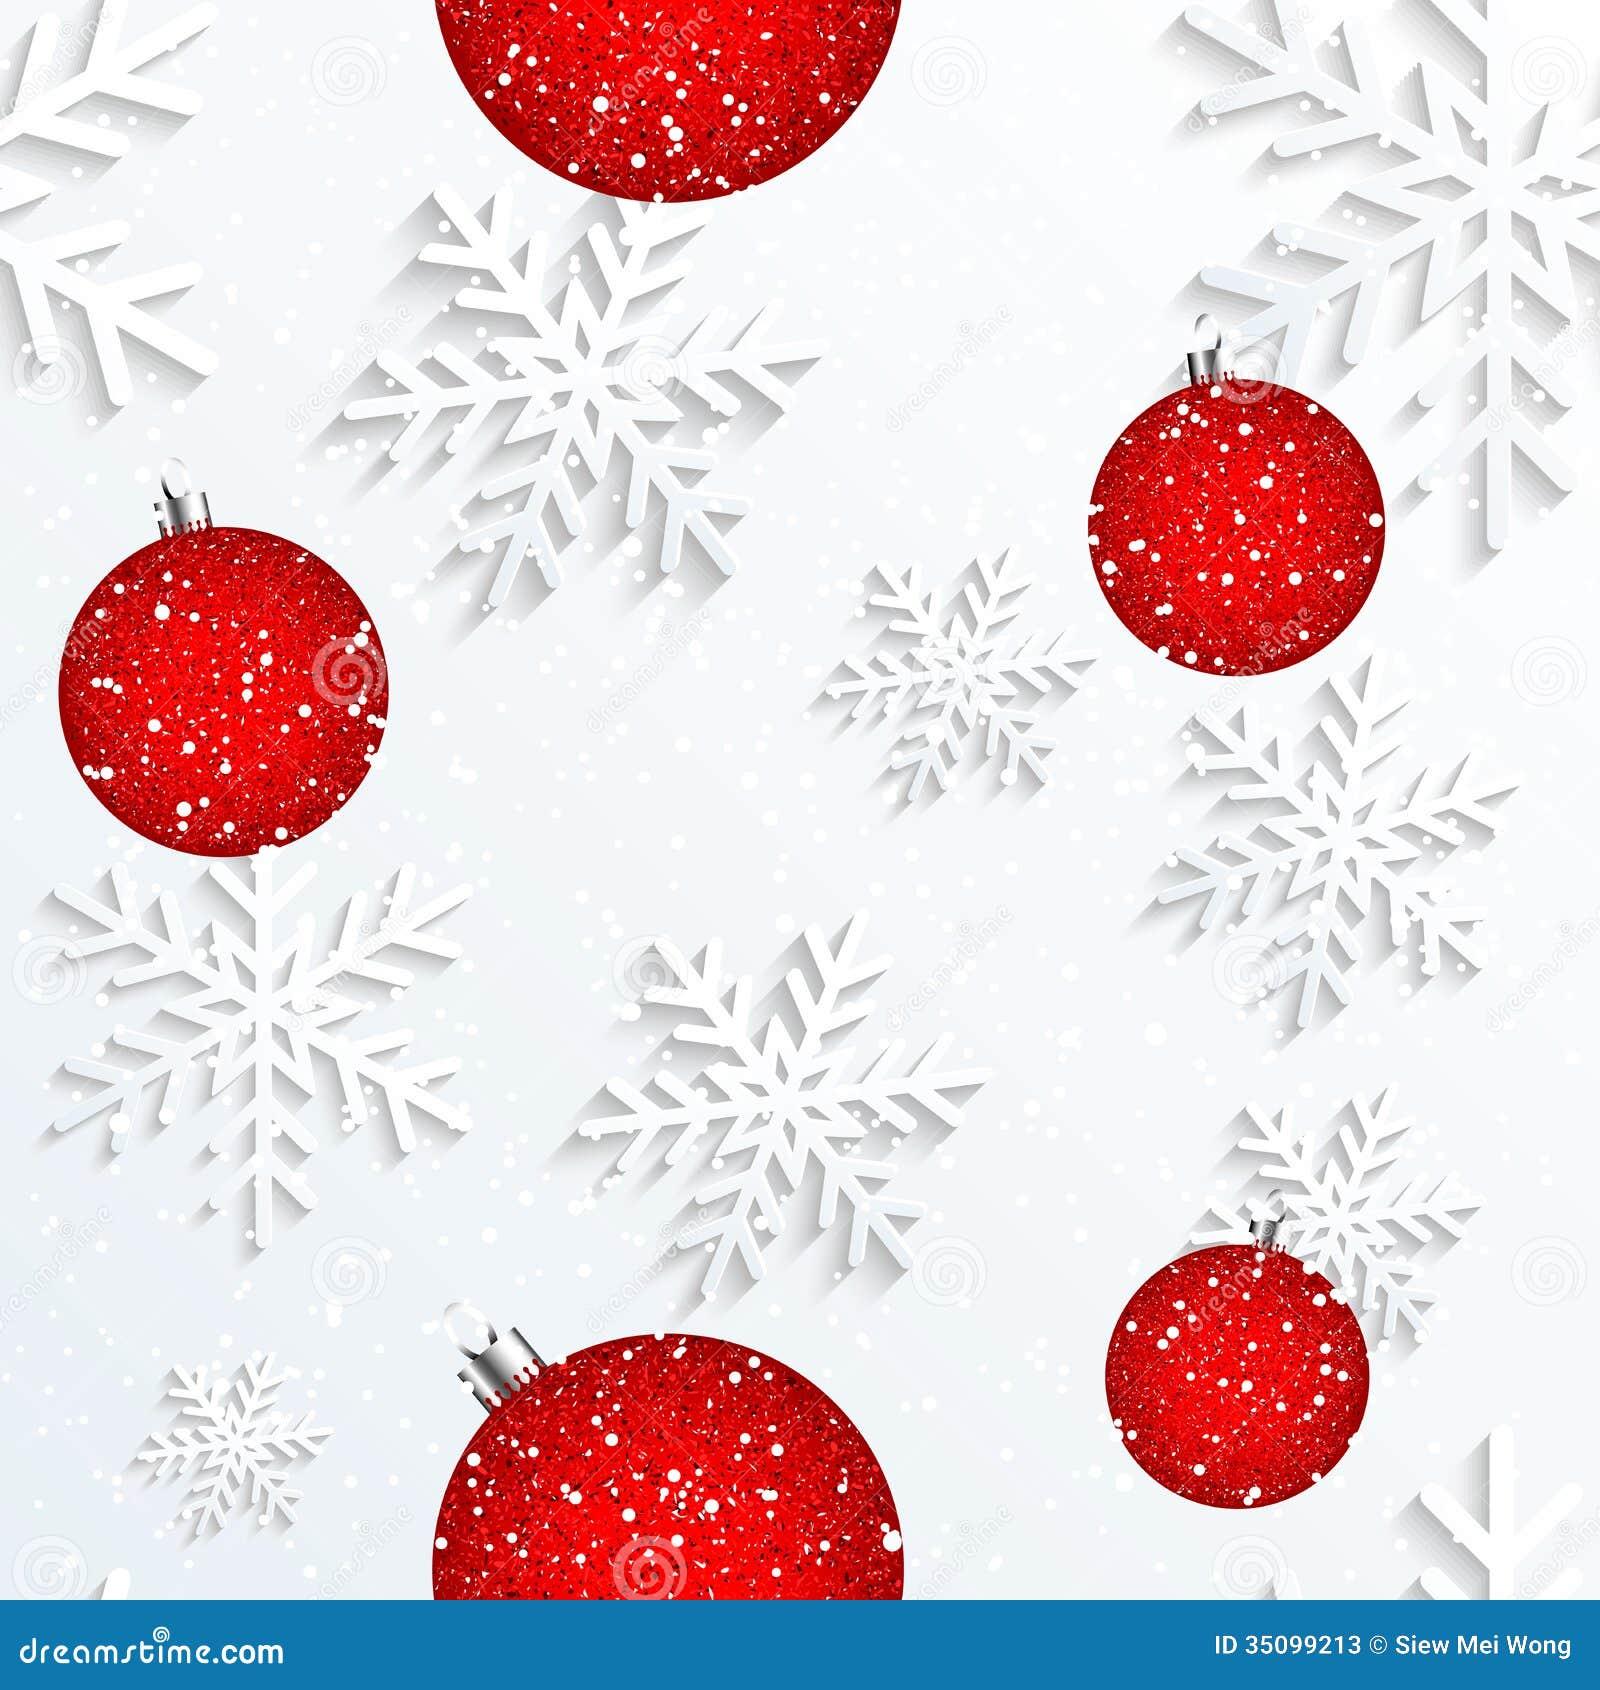 Blue snowflake background free vector download (54,537 ... |White Snowflake Wallpaper